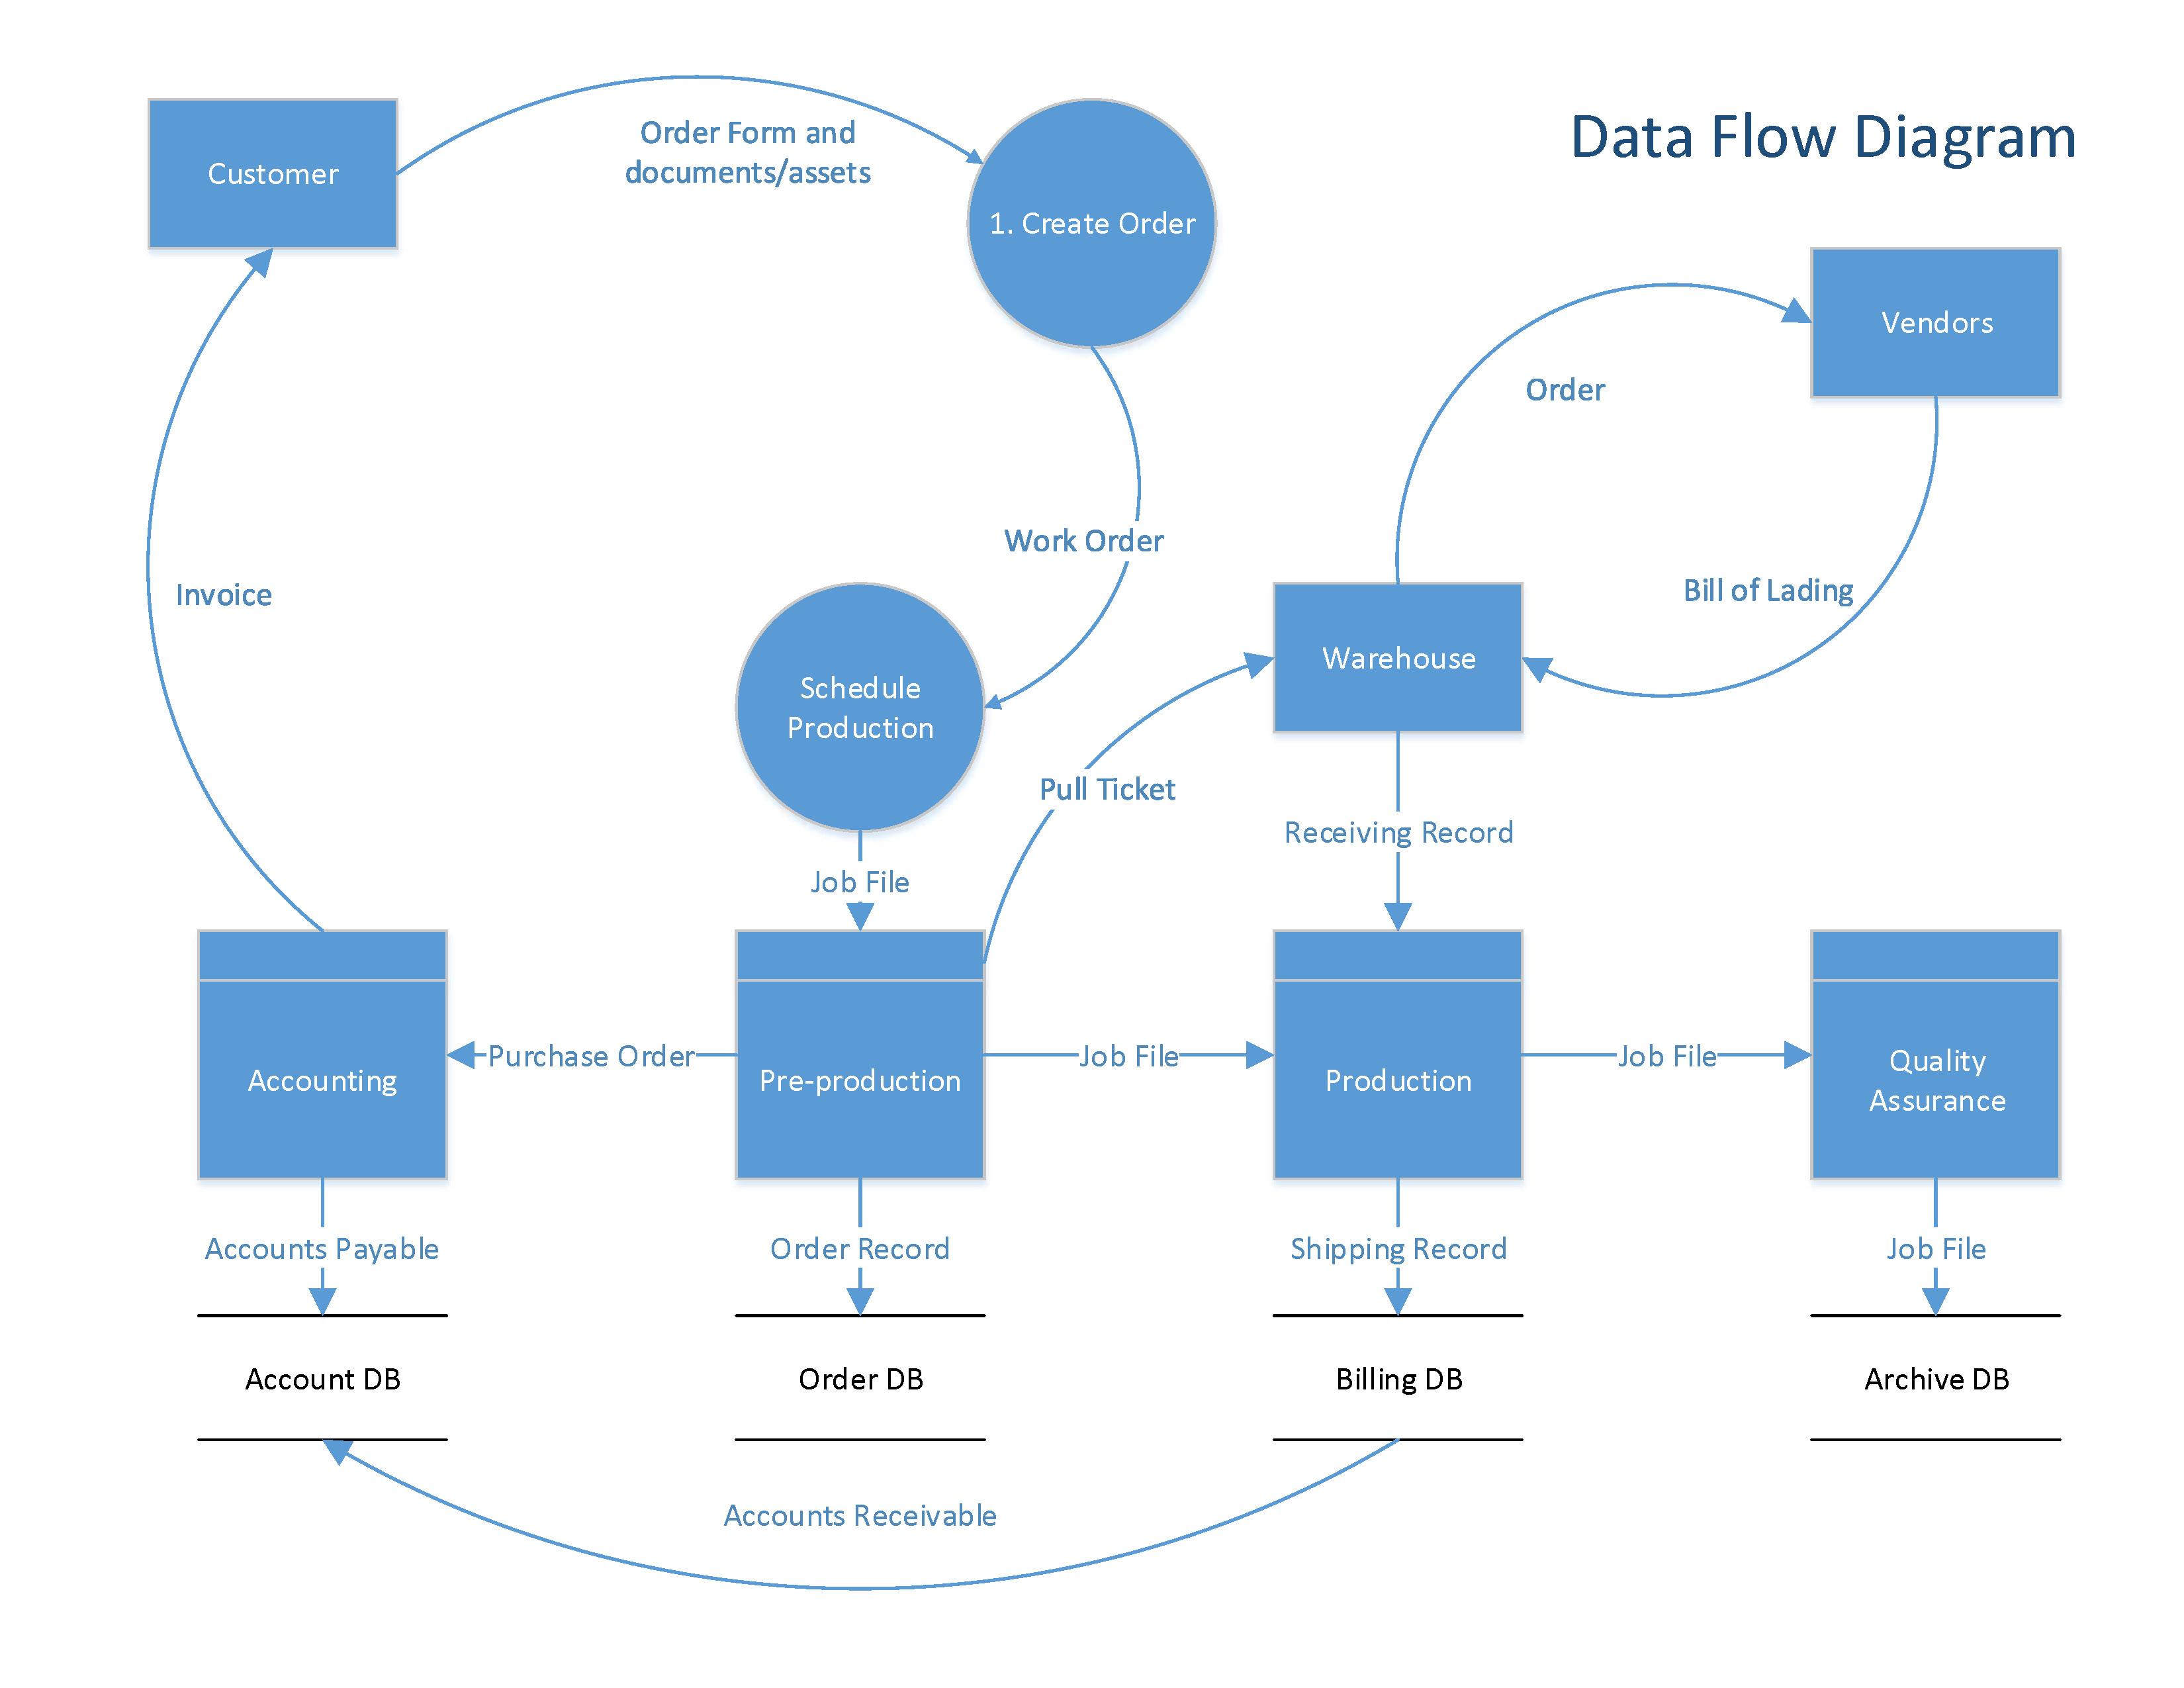 accounts payable system context data flow diagram